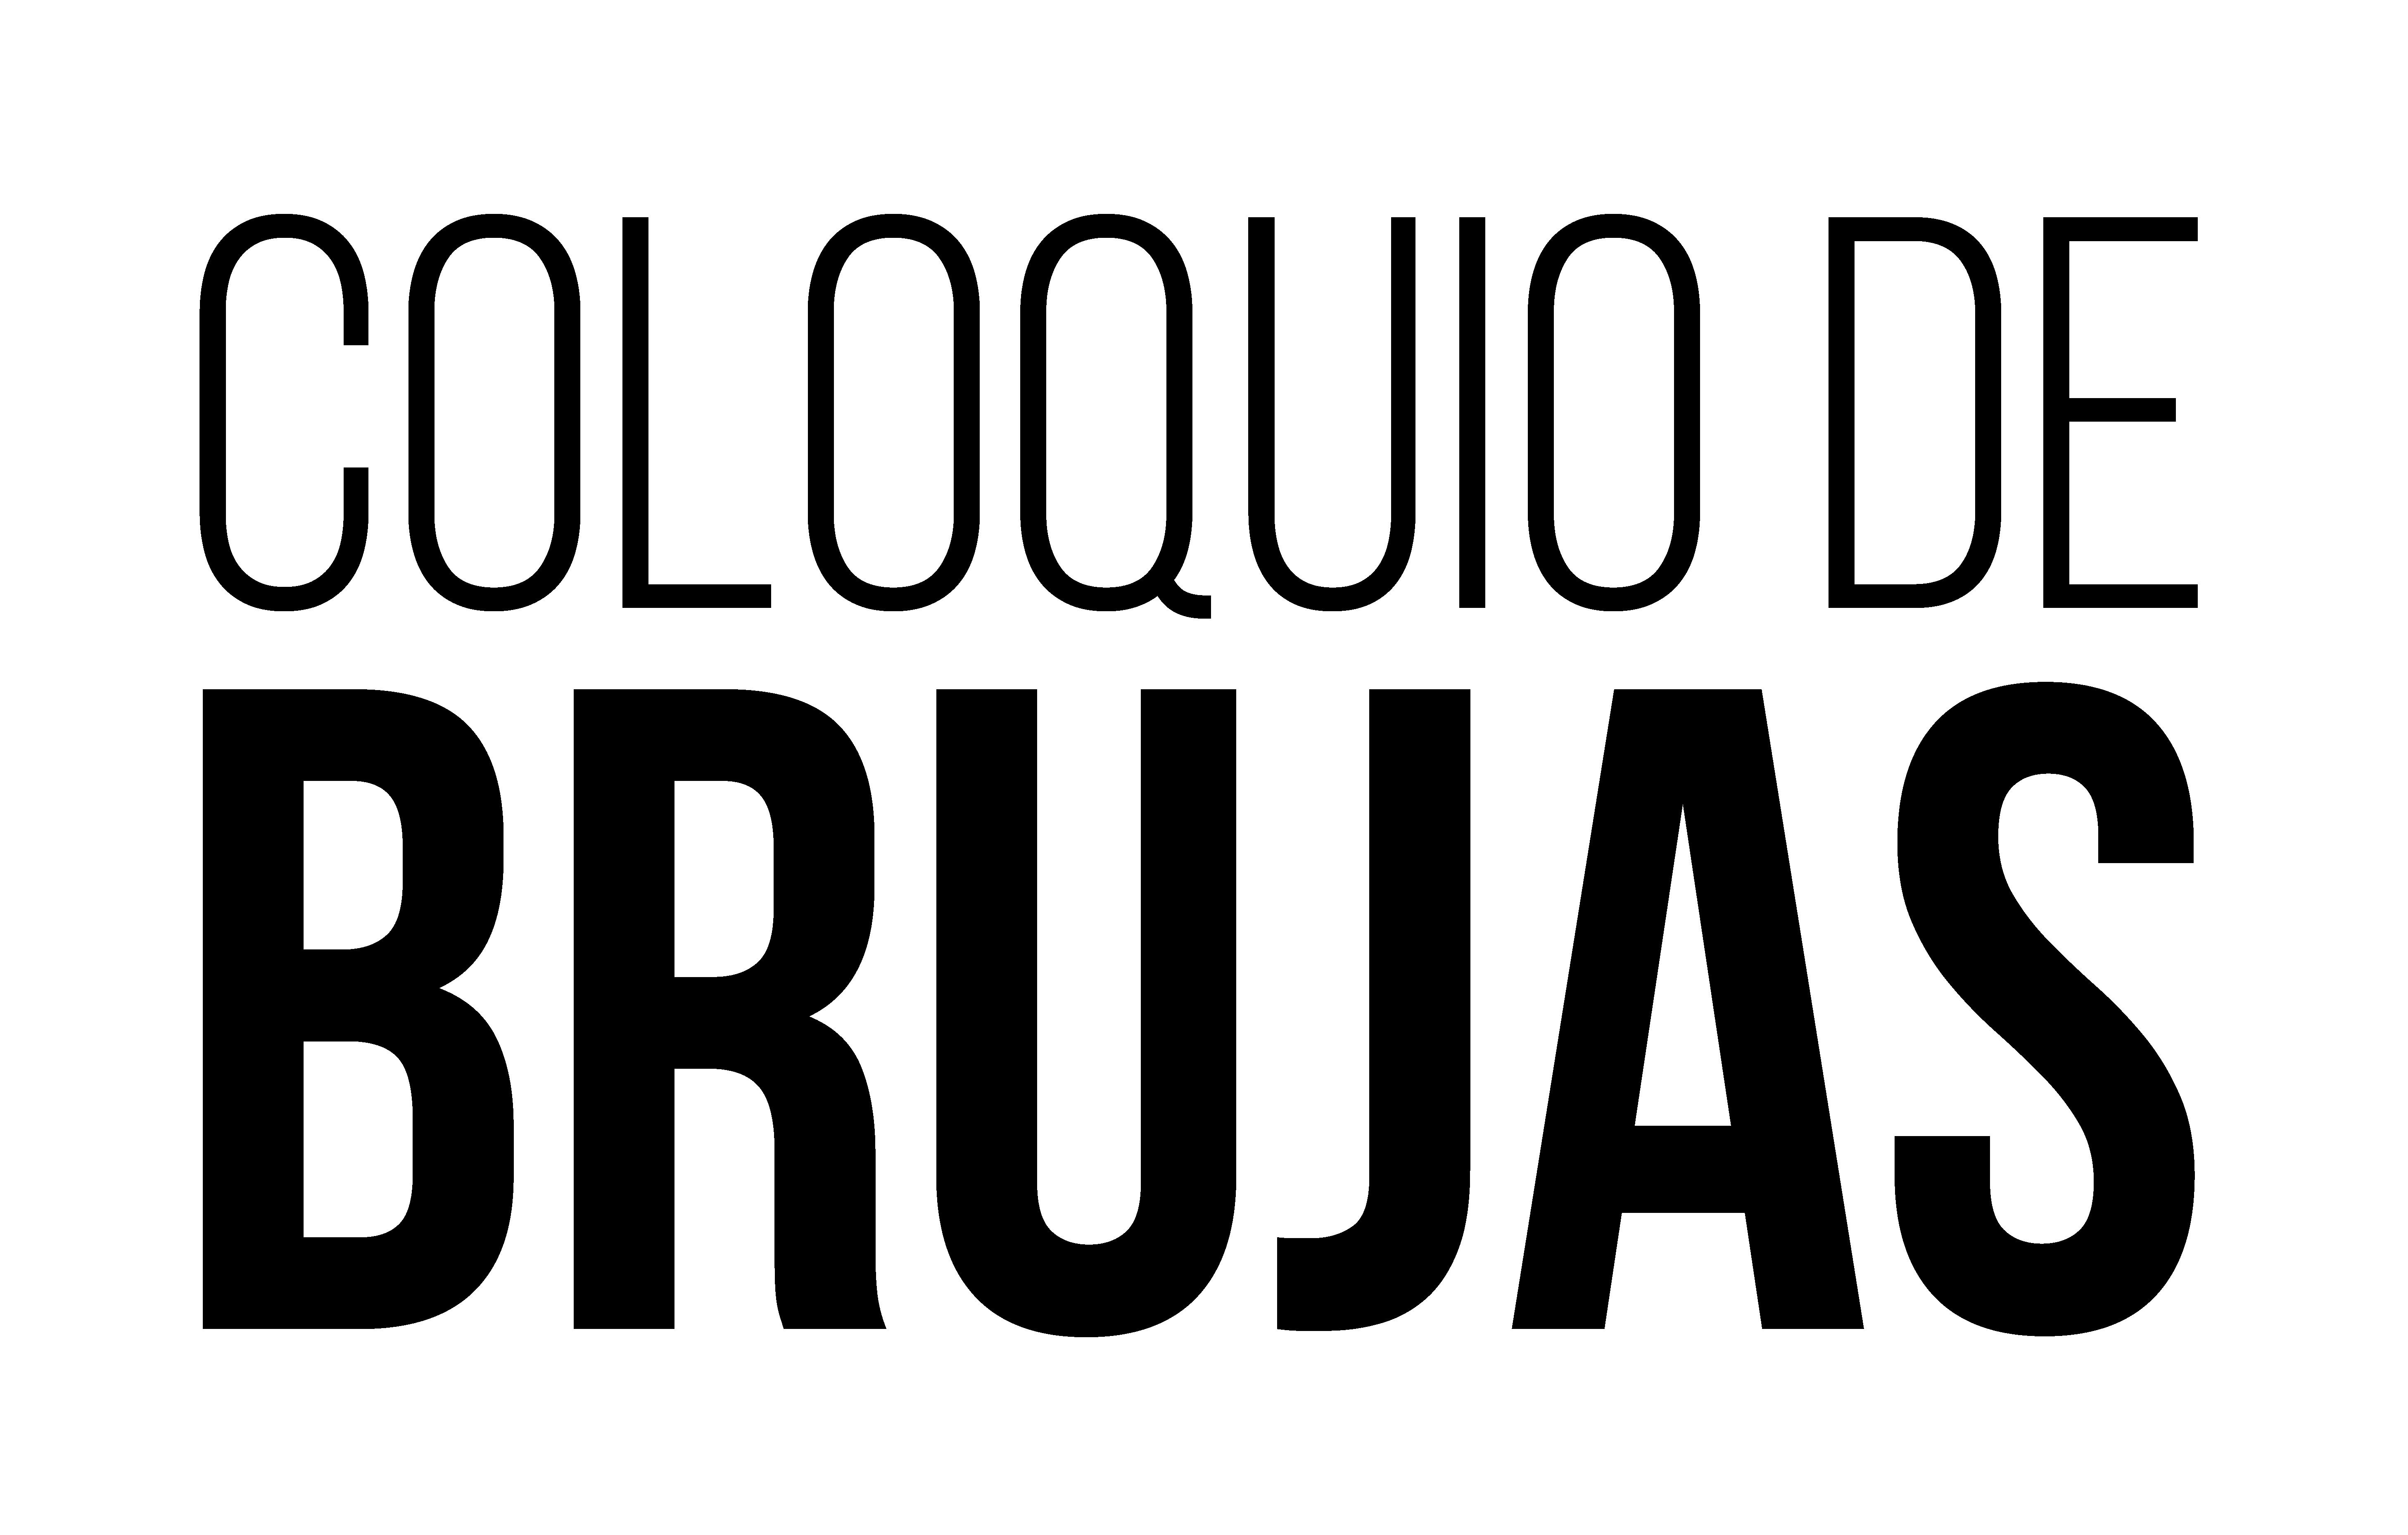 Coloquio de Brujas